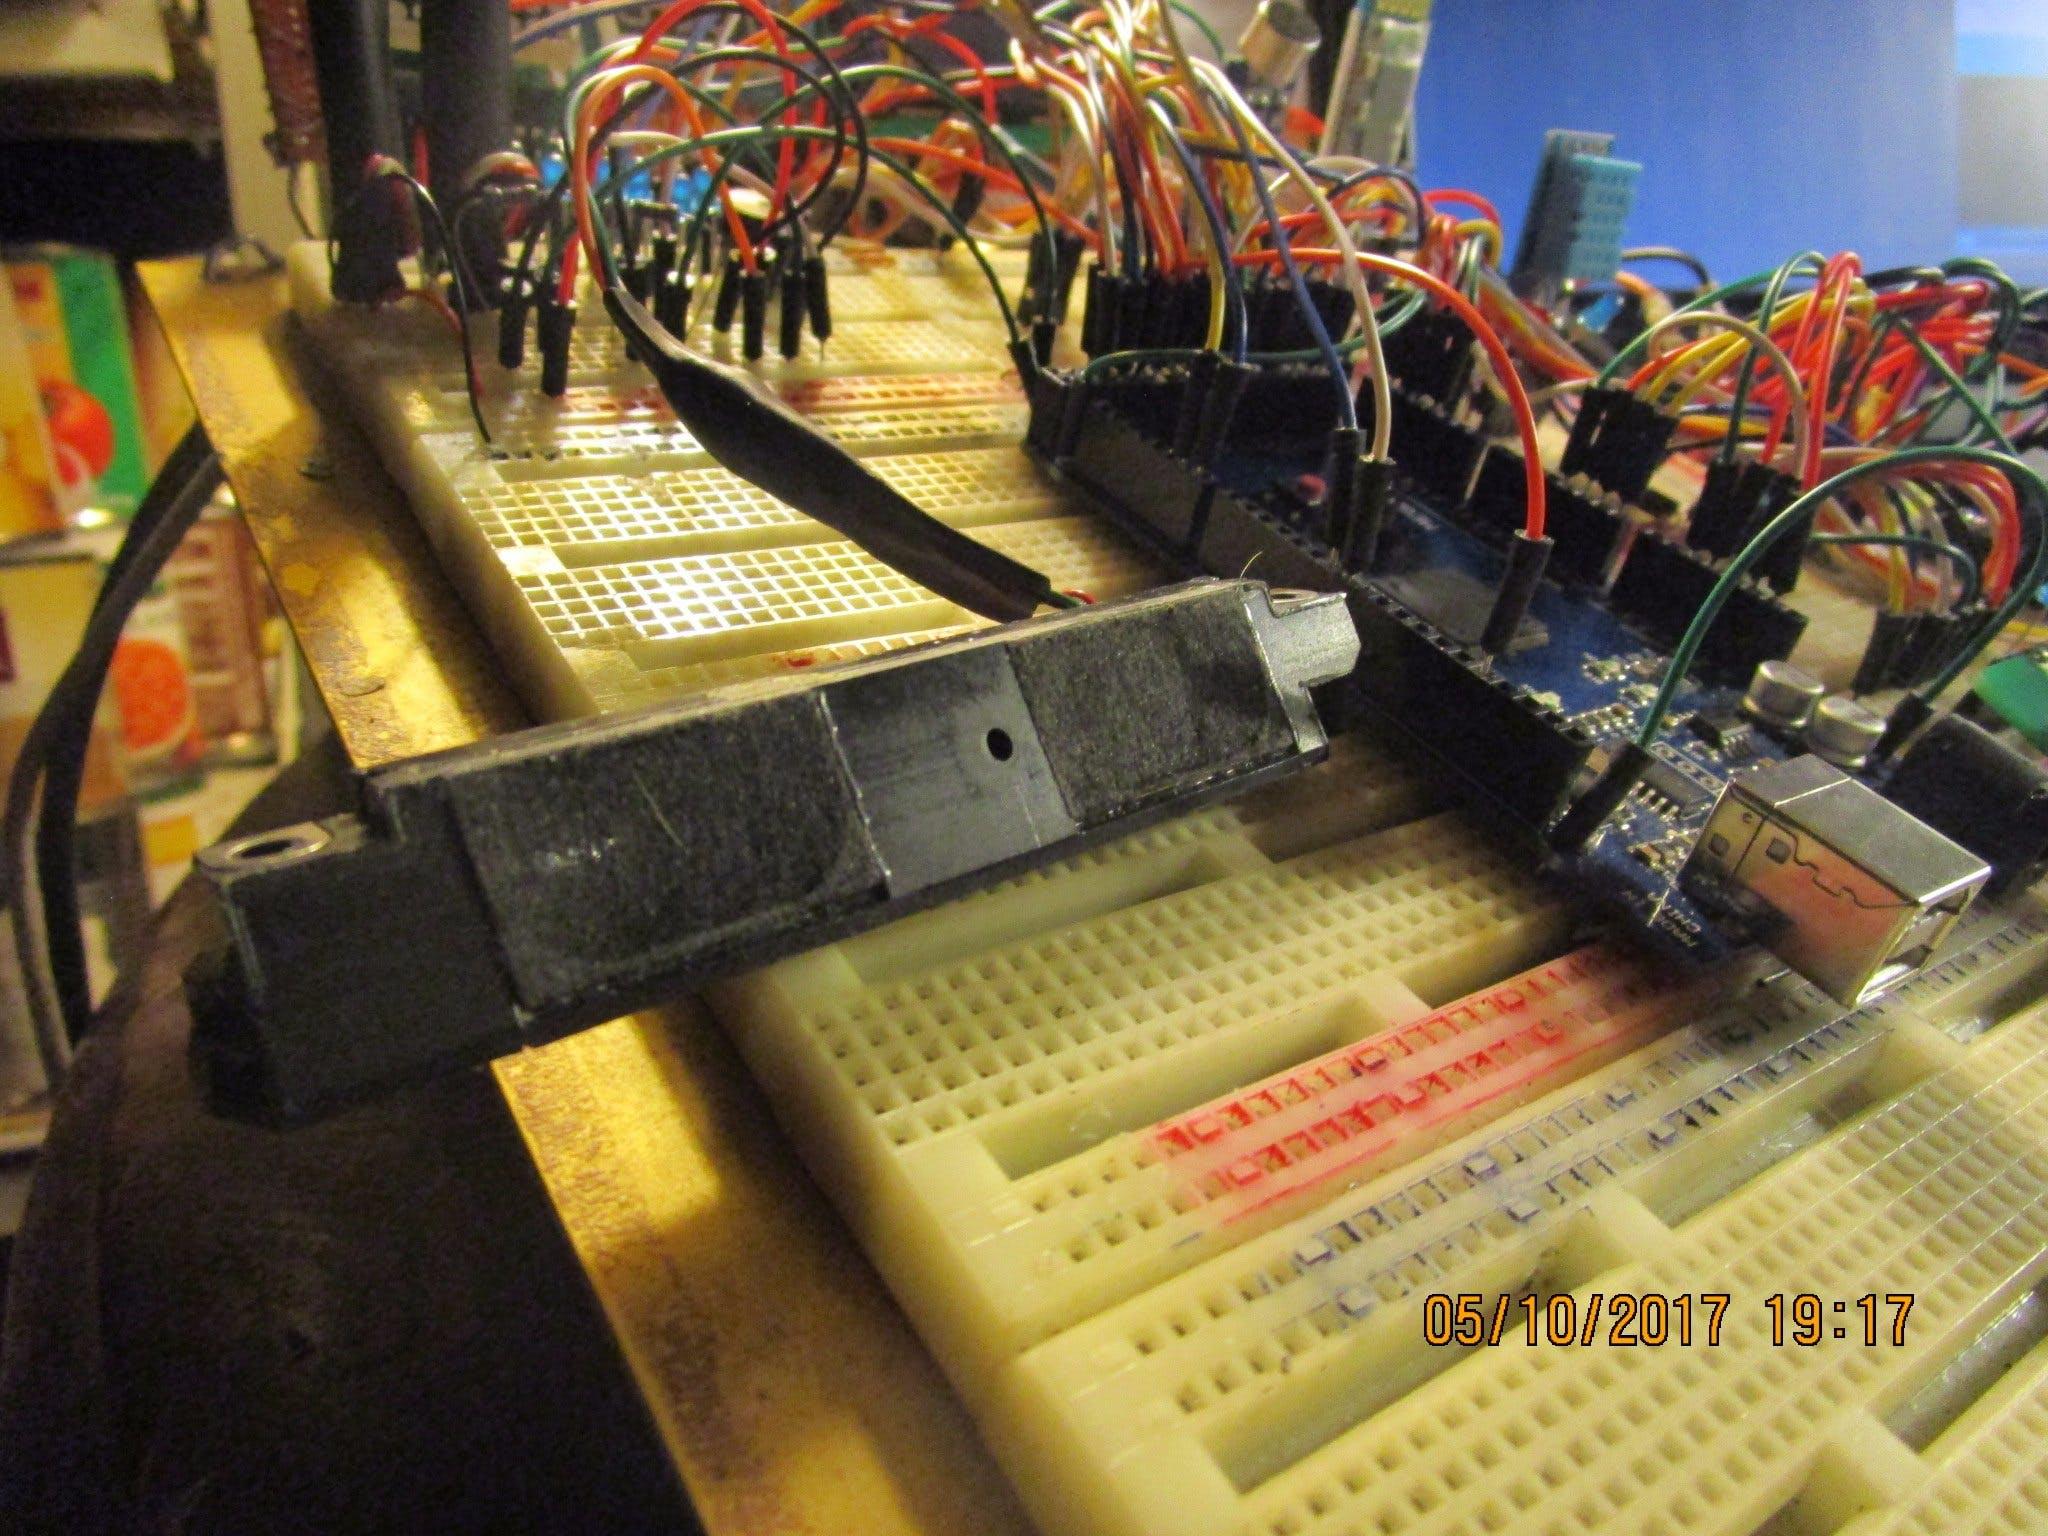 MEGA BREAD - Stereo Power Audio Amplifiers